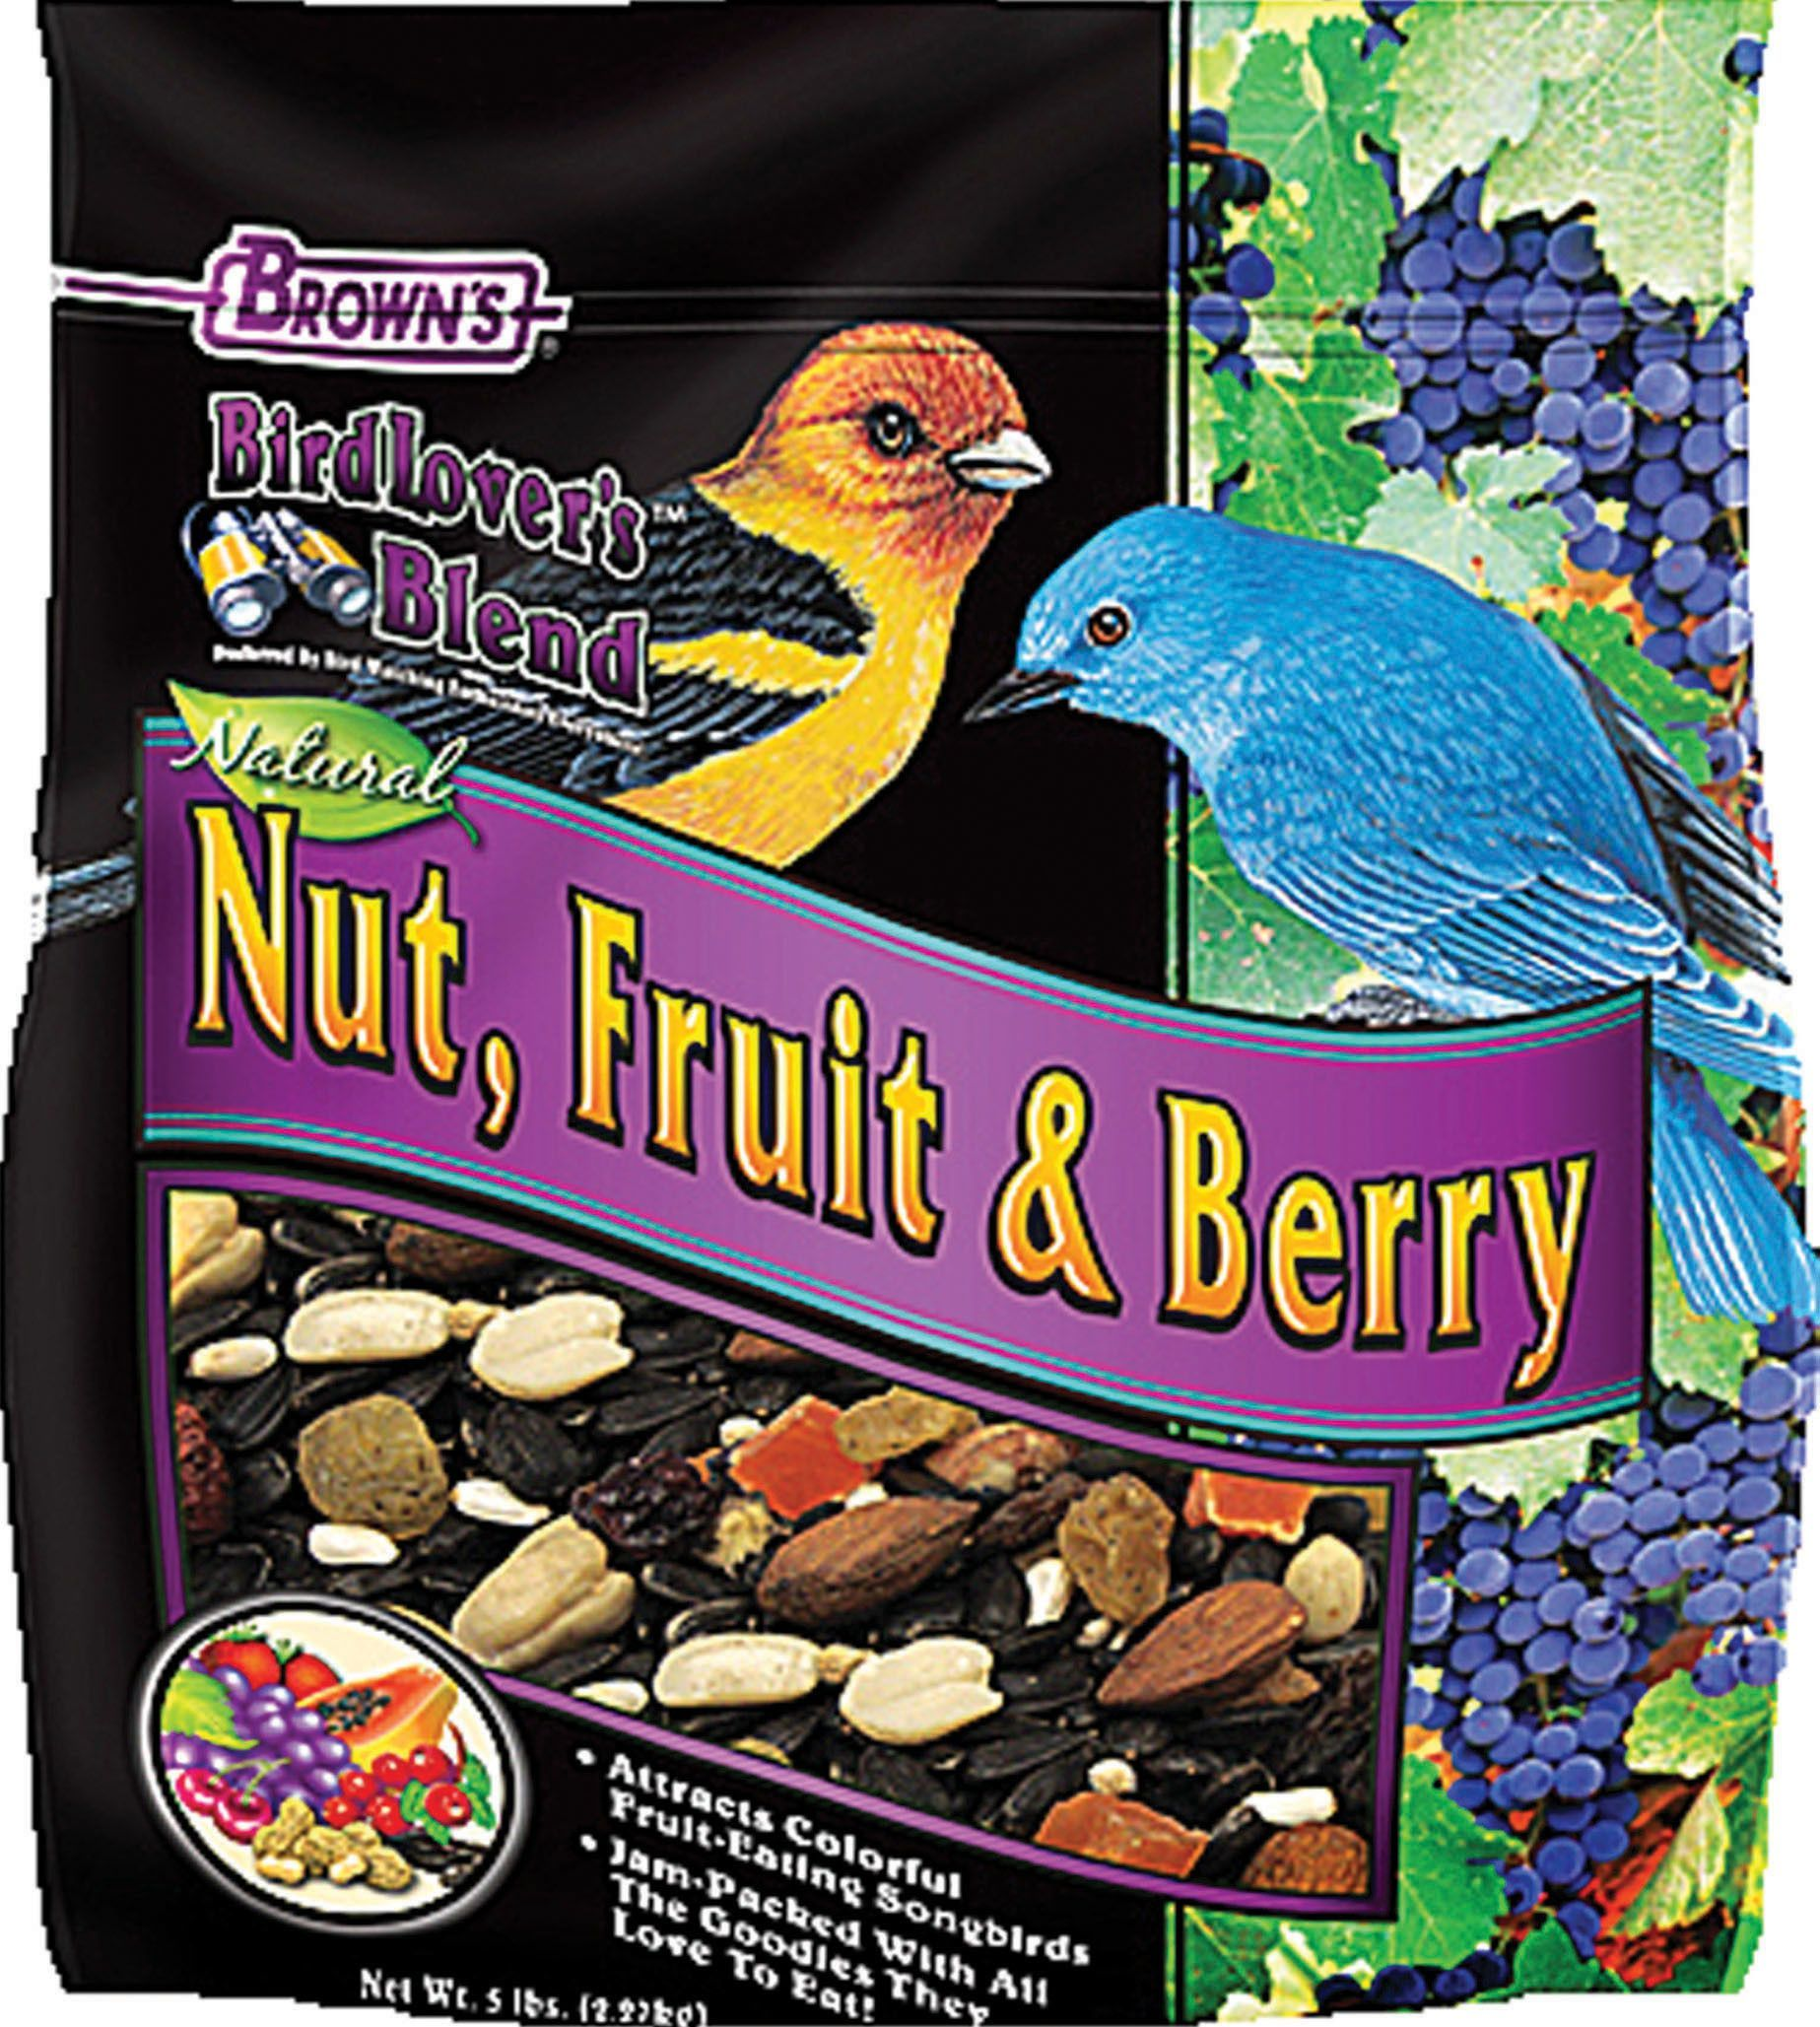 Bird lovers blend fruit nut and berry blend fruits